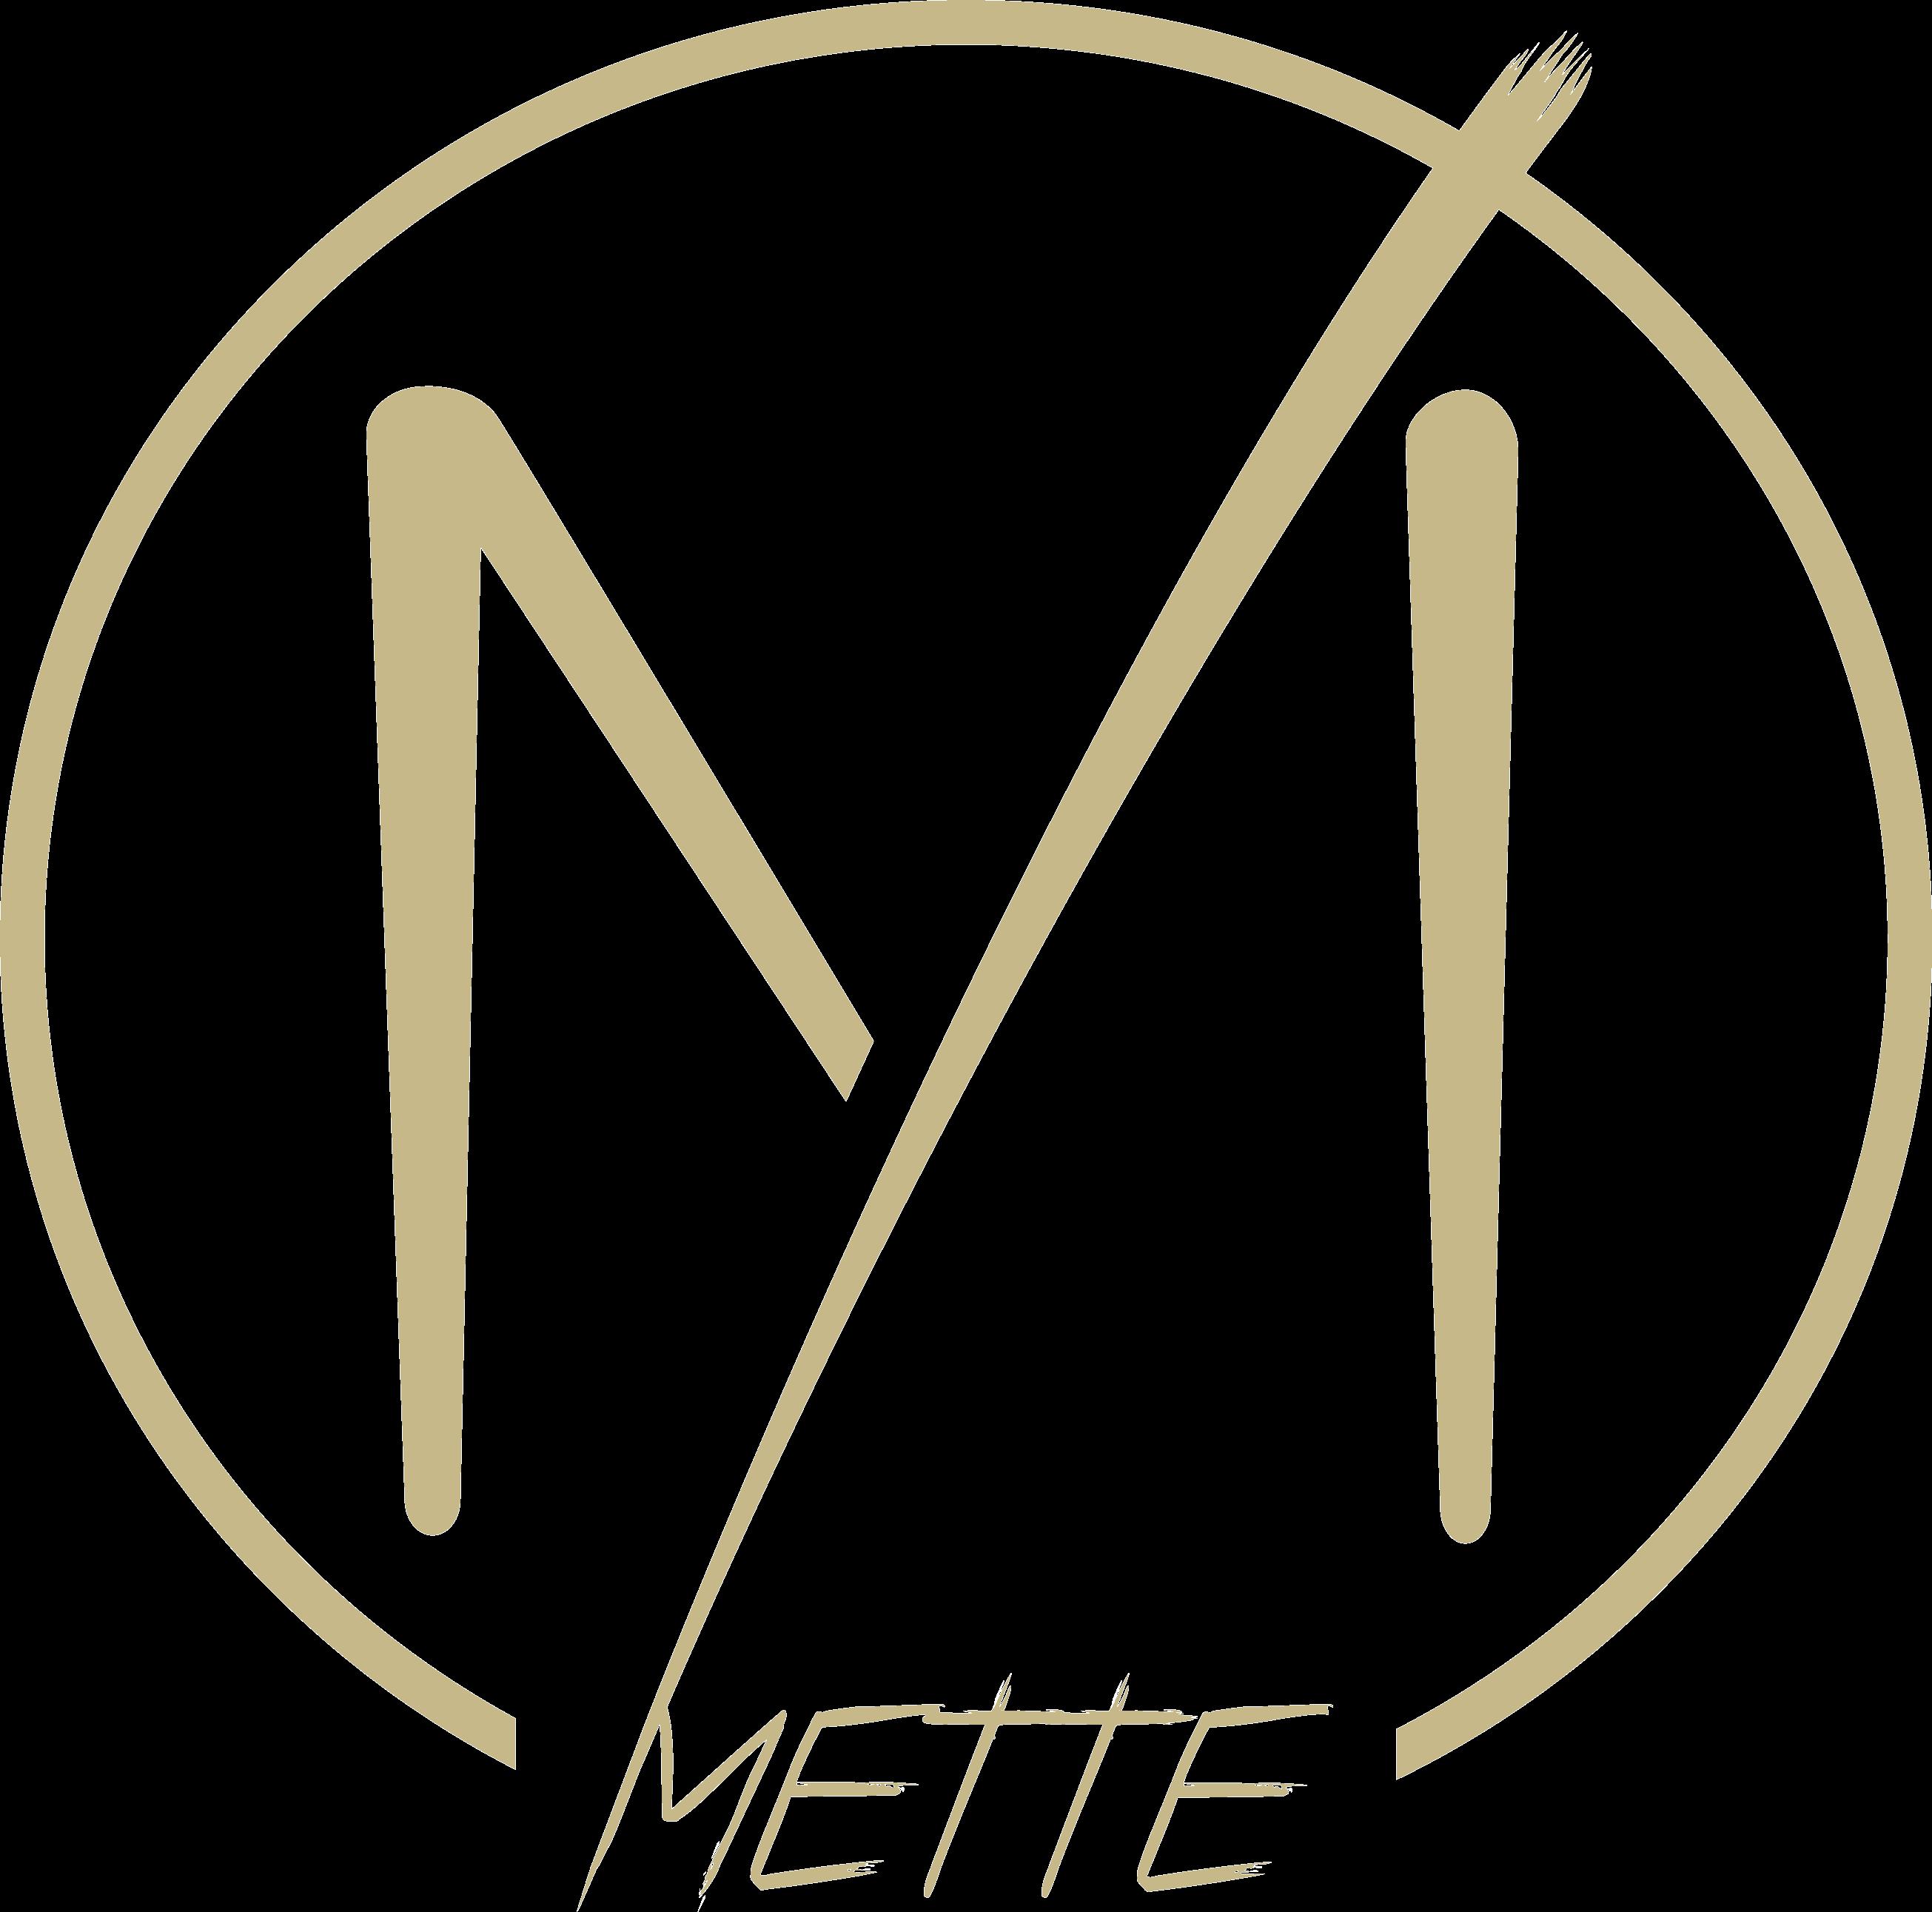 LEN METTE